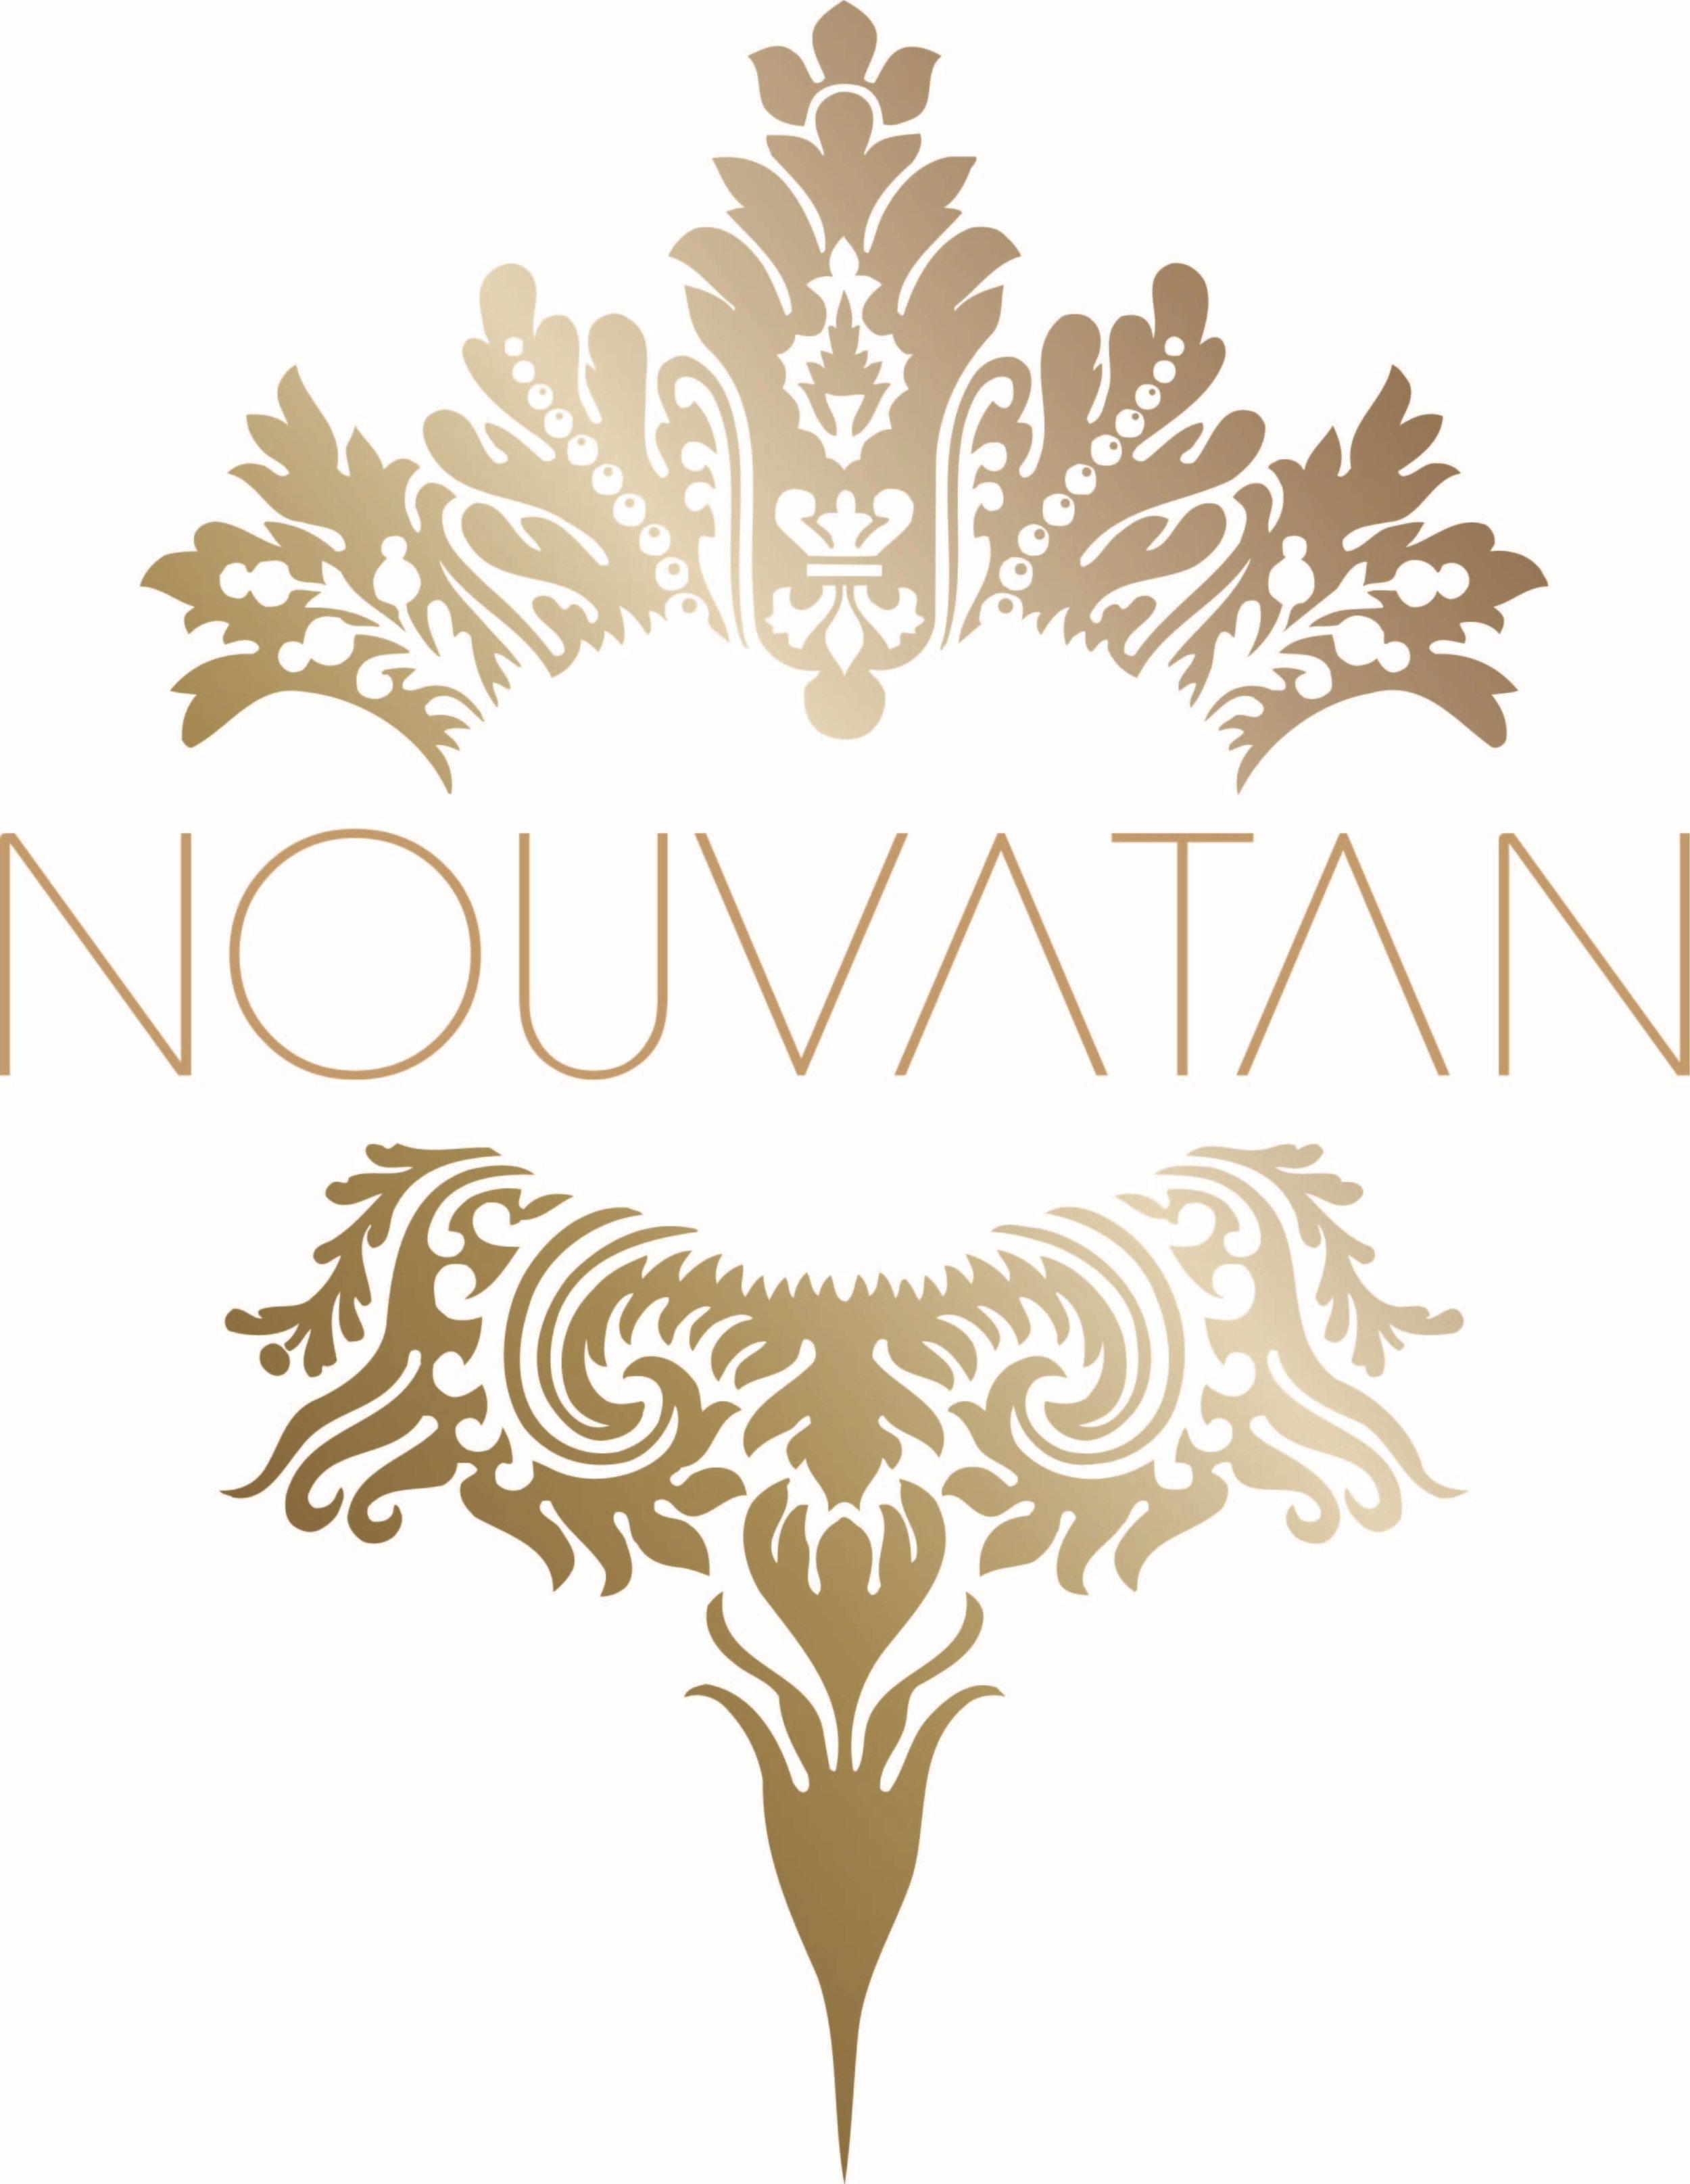 Nouvatan logo high res.jpg